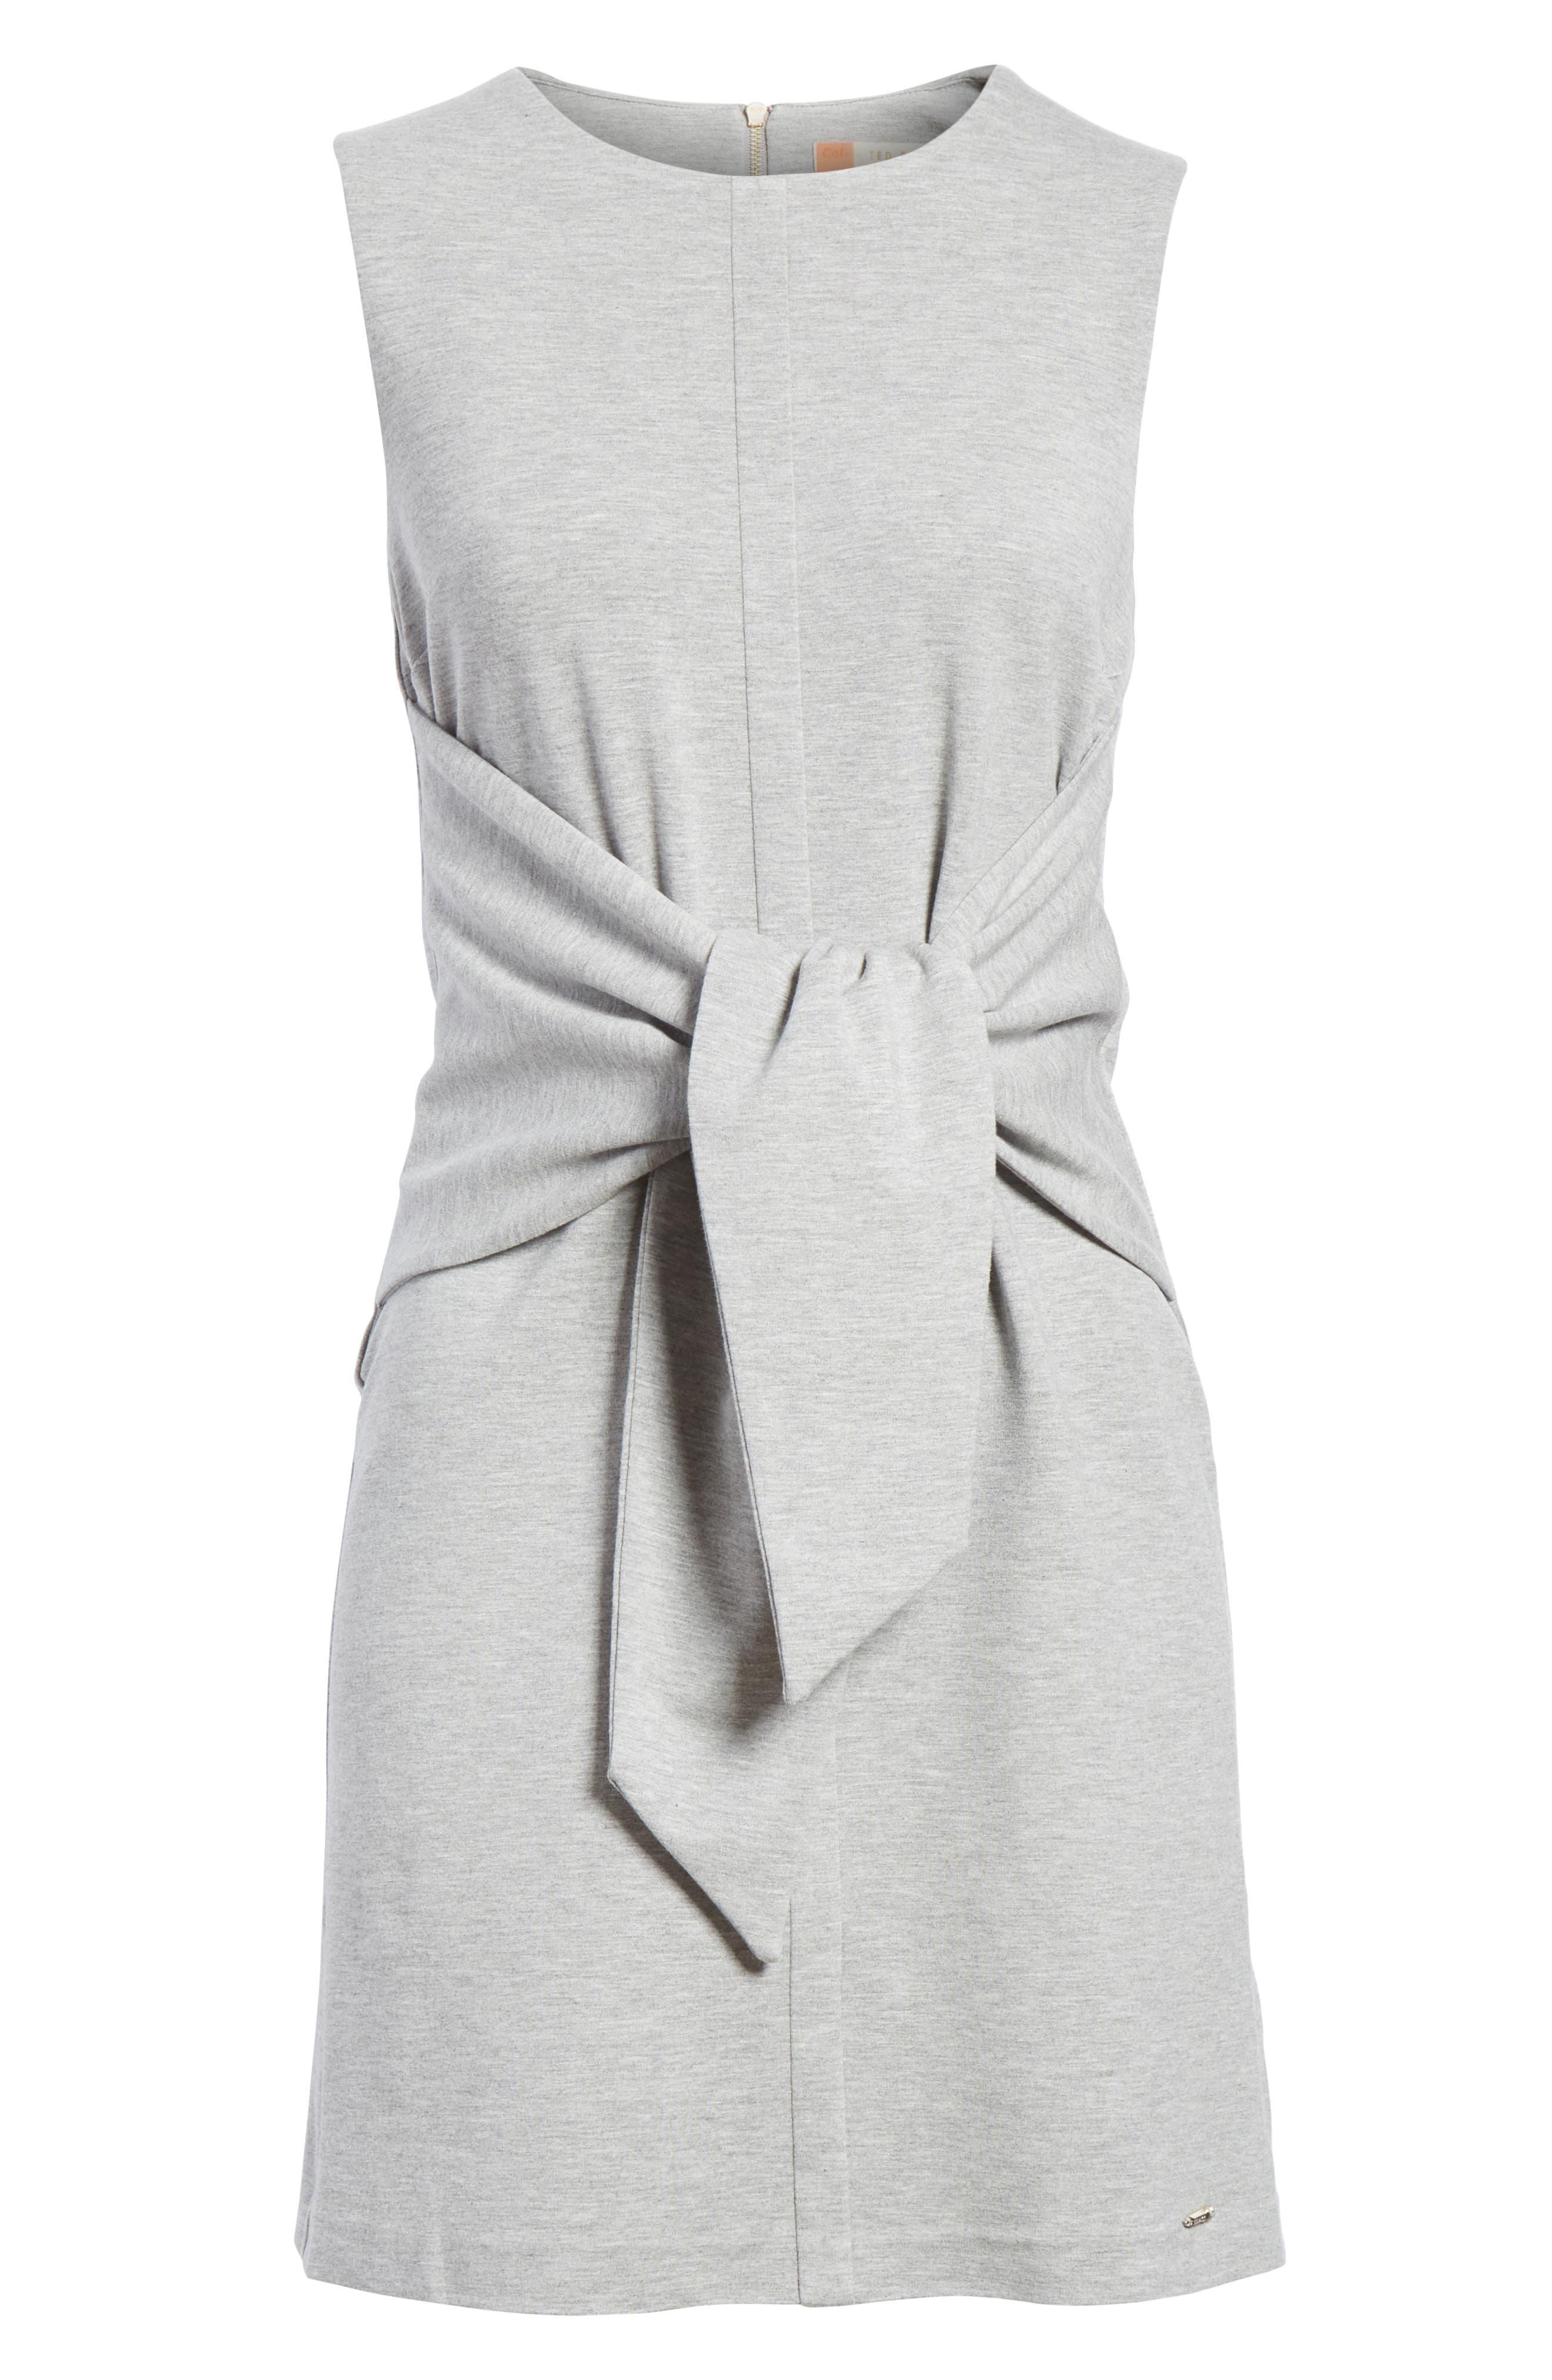 Evalina Tie Front Dress,                             Alternate thumbnail 6, color,                             031